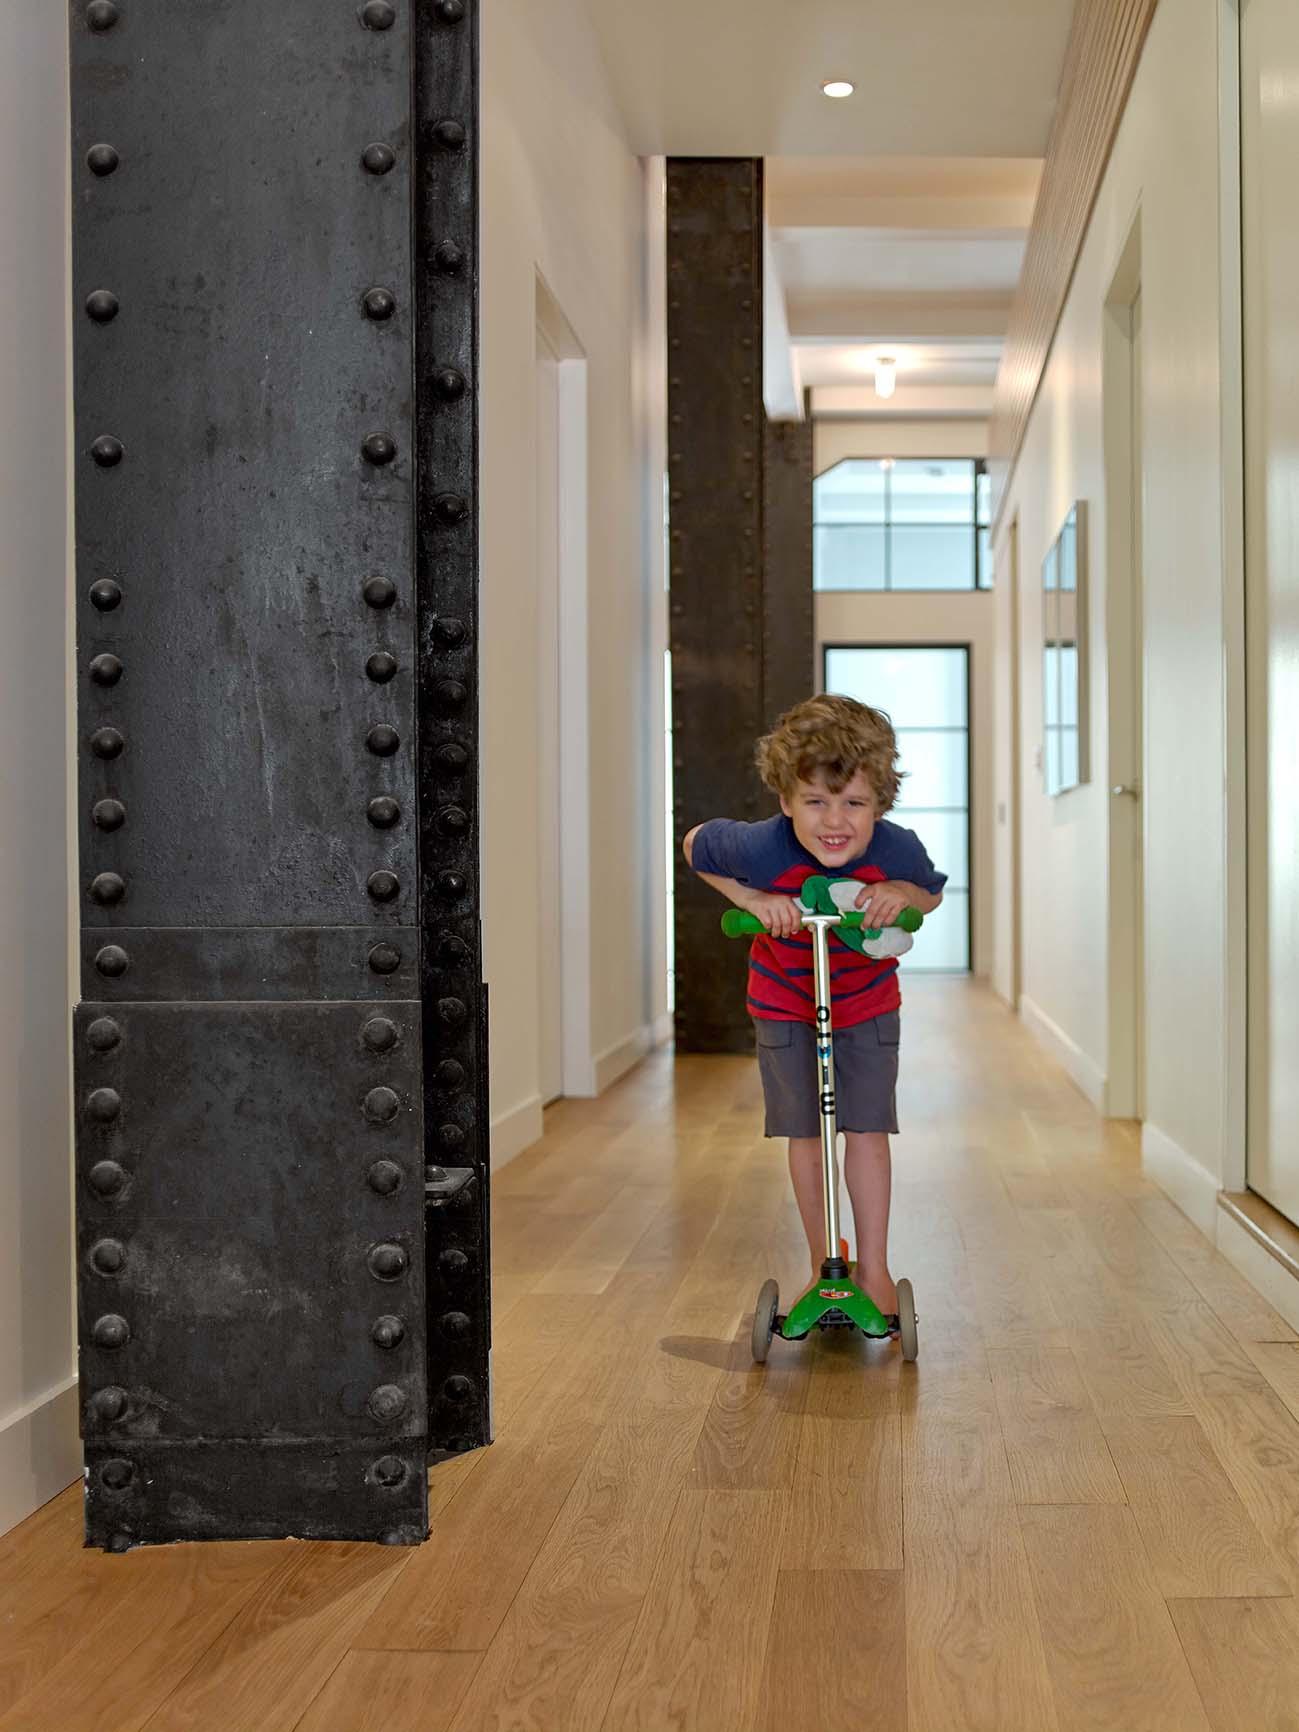 Flat Iron Loft Child on Scooter in Hallway